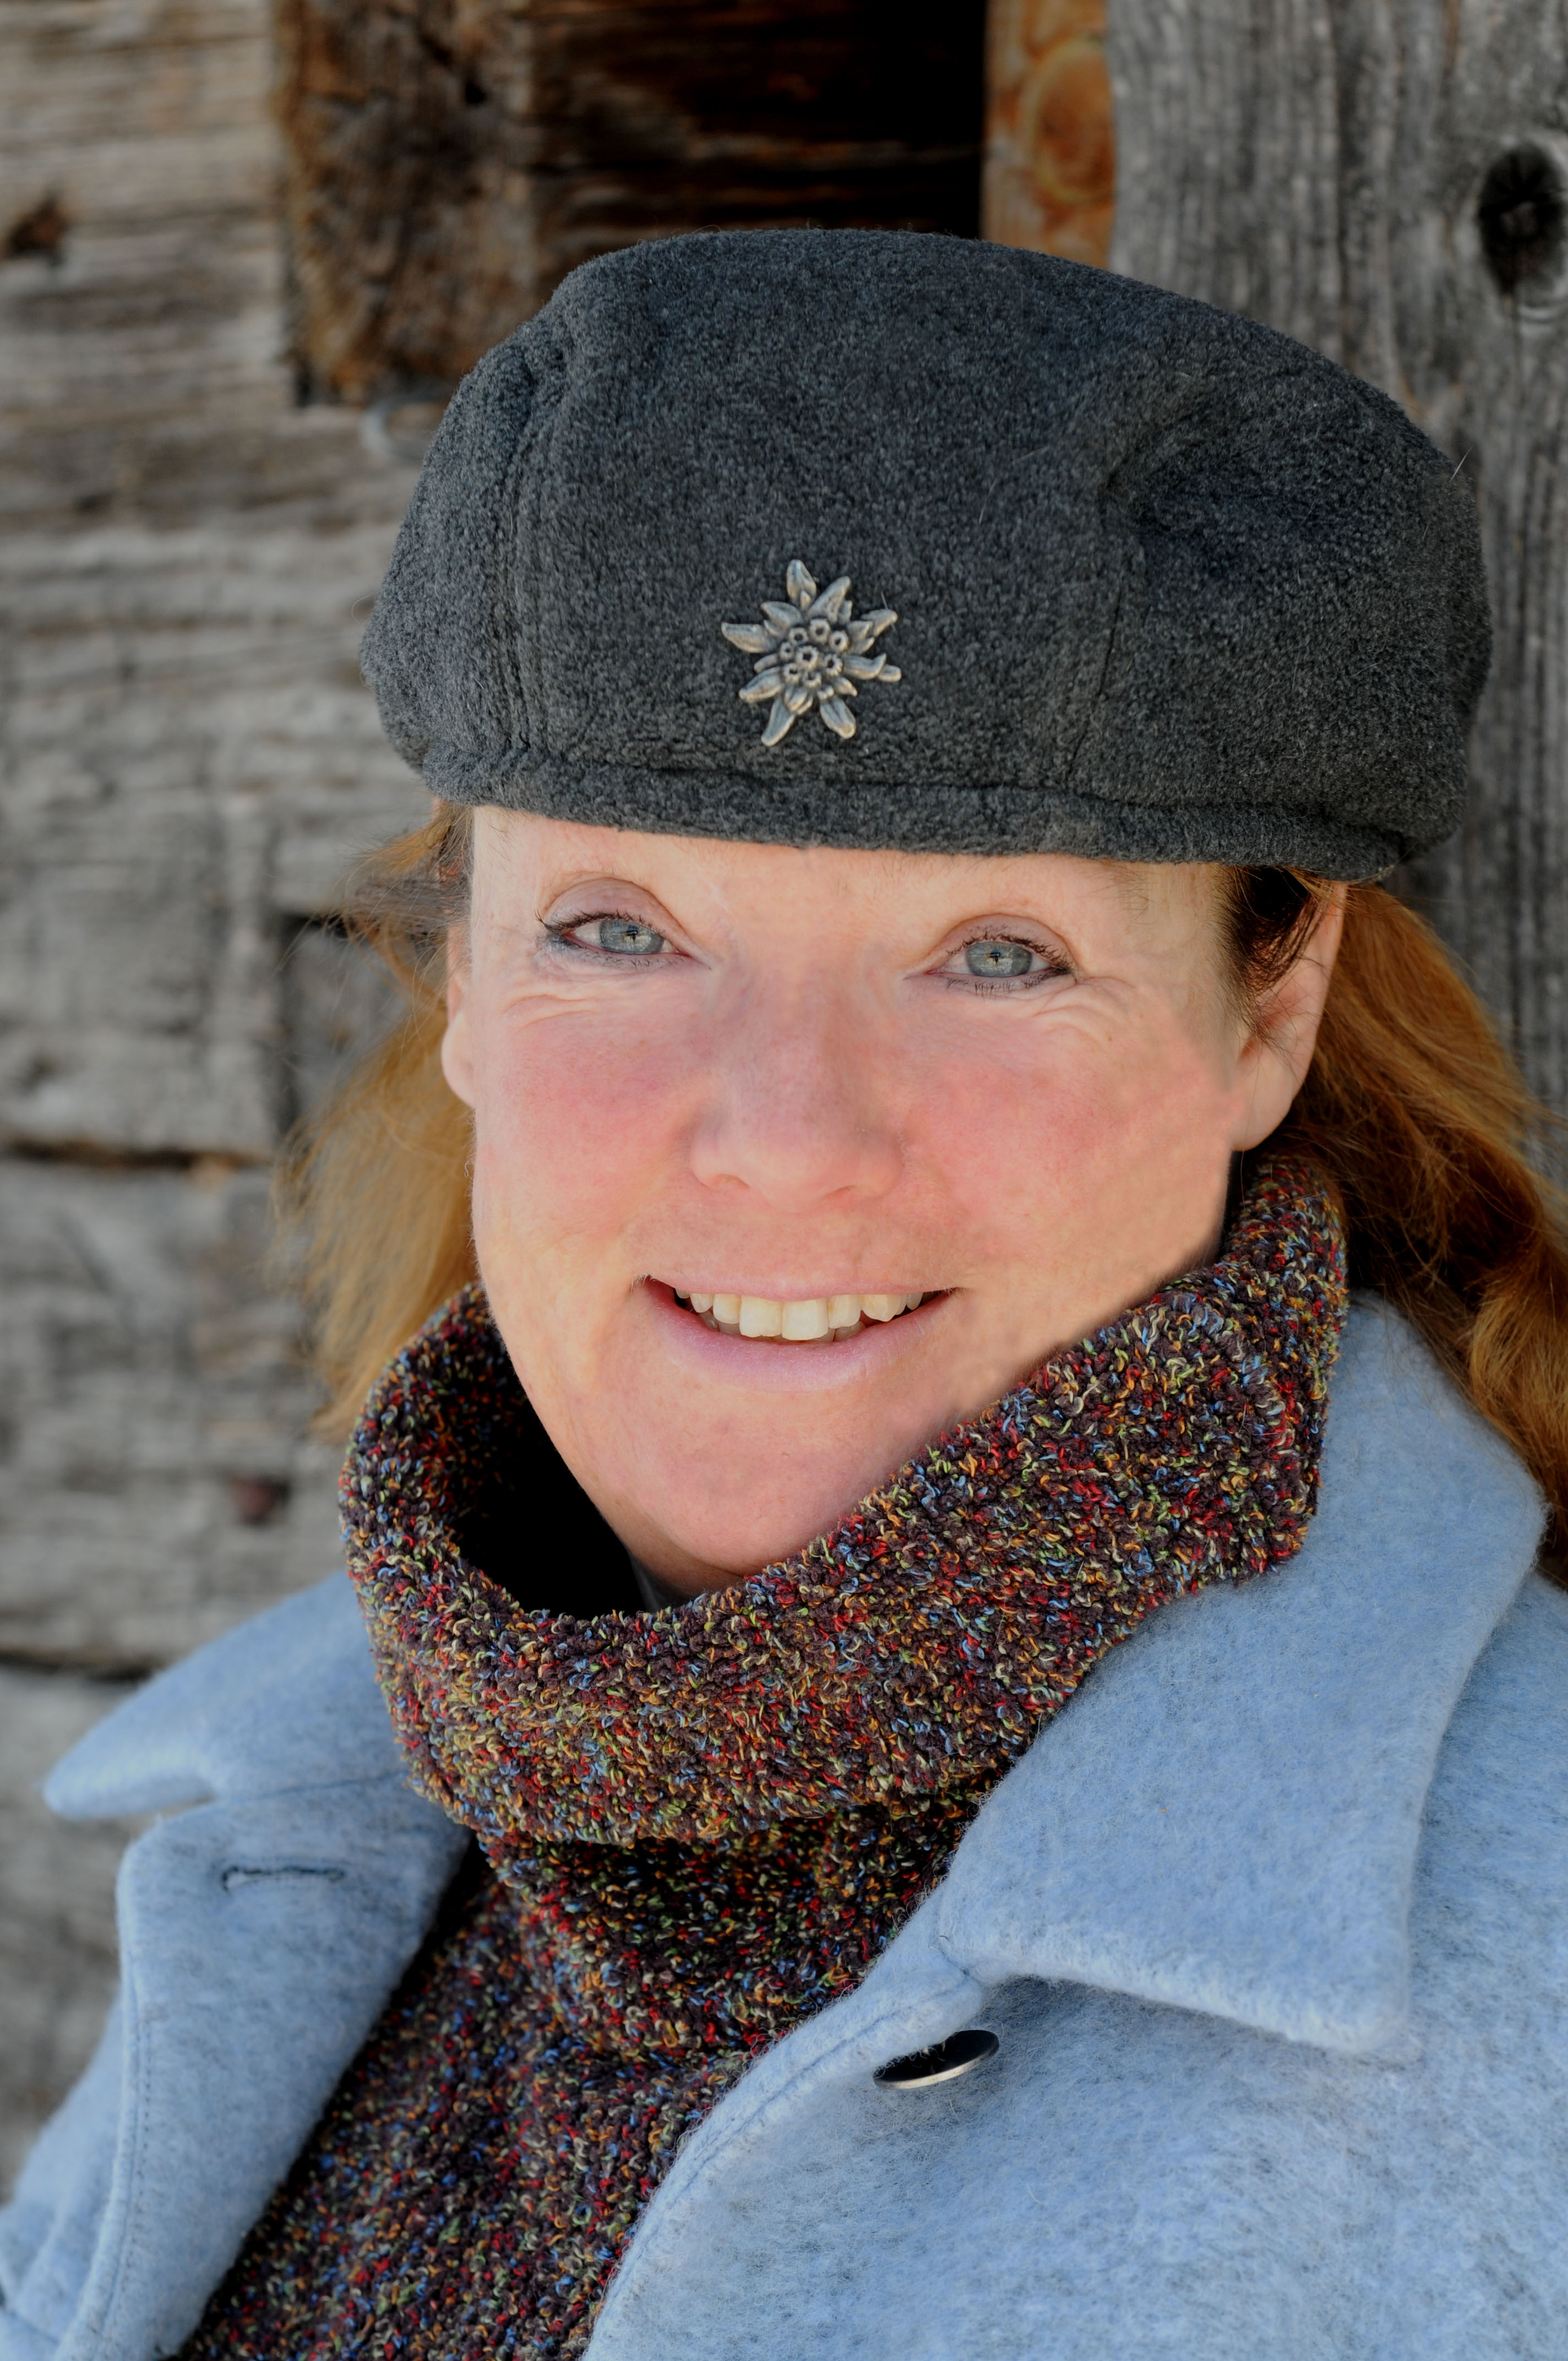 Nicola Förg (2009)